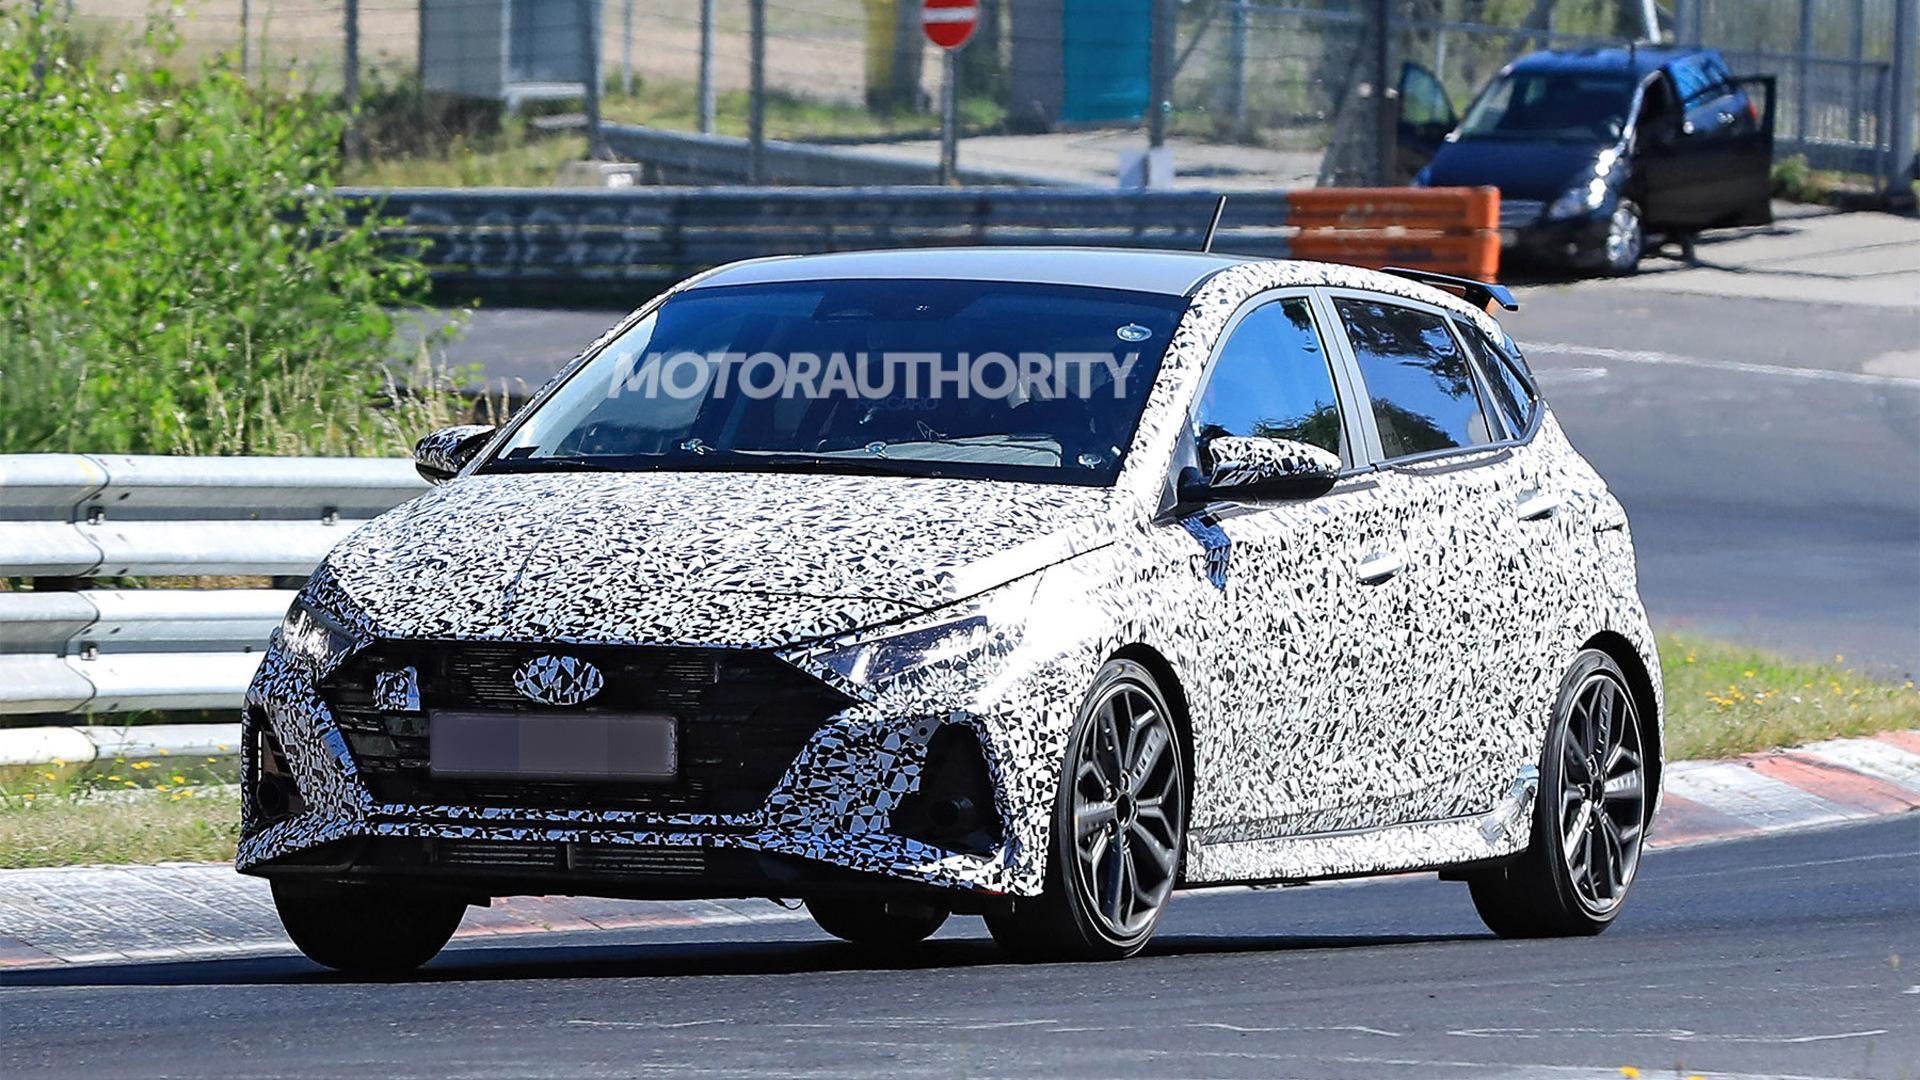 2021 Hyundai i20 N spy shots - Photo credit:S. Baldauf/SB-Medien